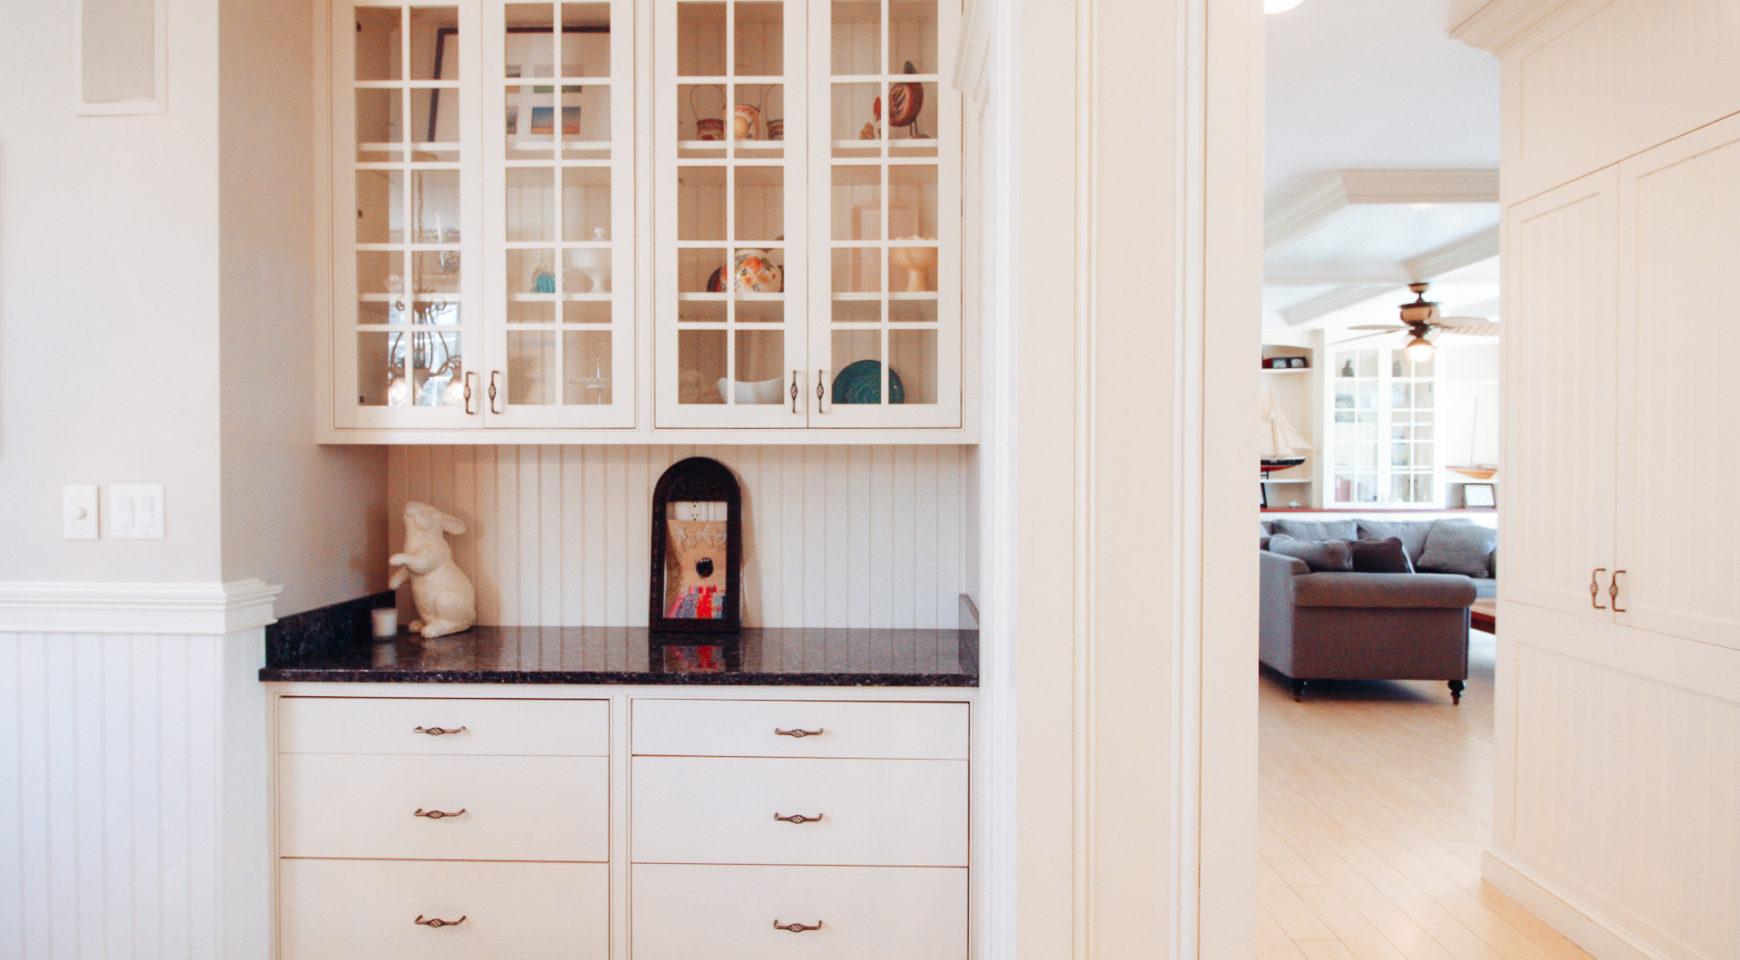 Luxe_and_Livable_Interior_Design_Blog_by_Maloney_Interiors_Newport_Rhode_Island_Fitzpatrick_Team_Remax_06.jpg